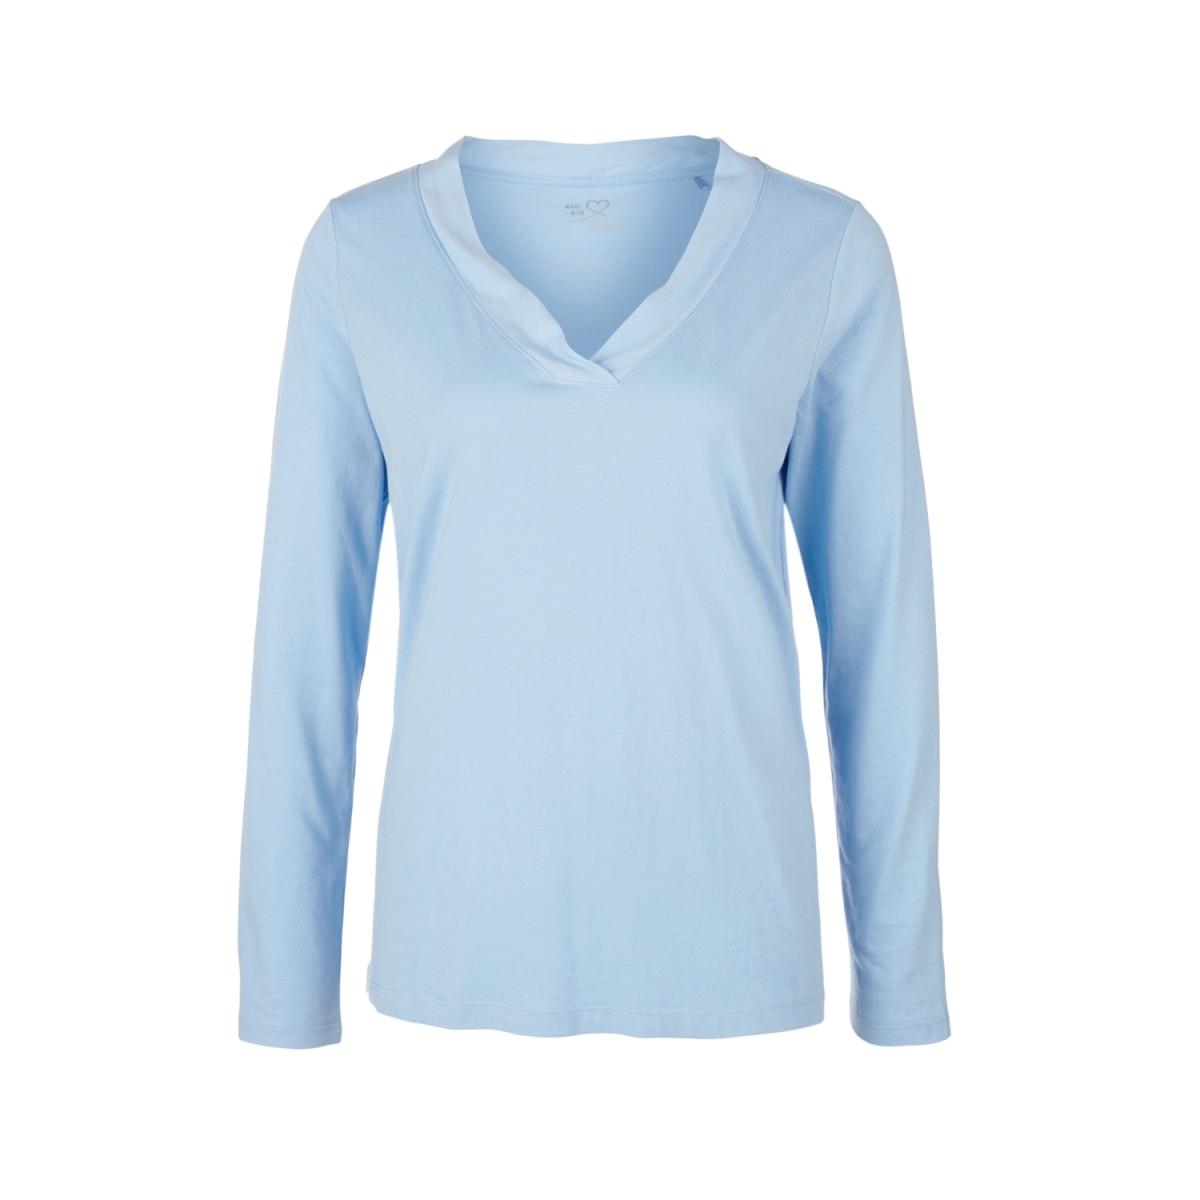 14811316381 s.oliver t-shirt 5304